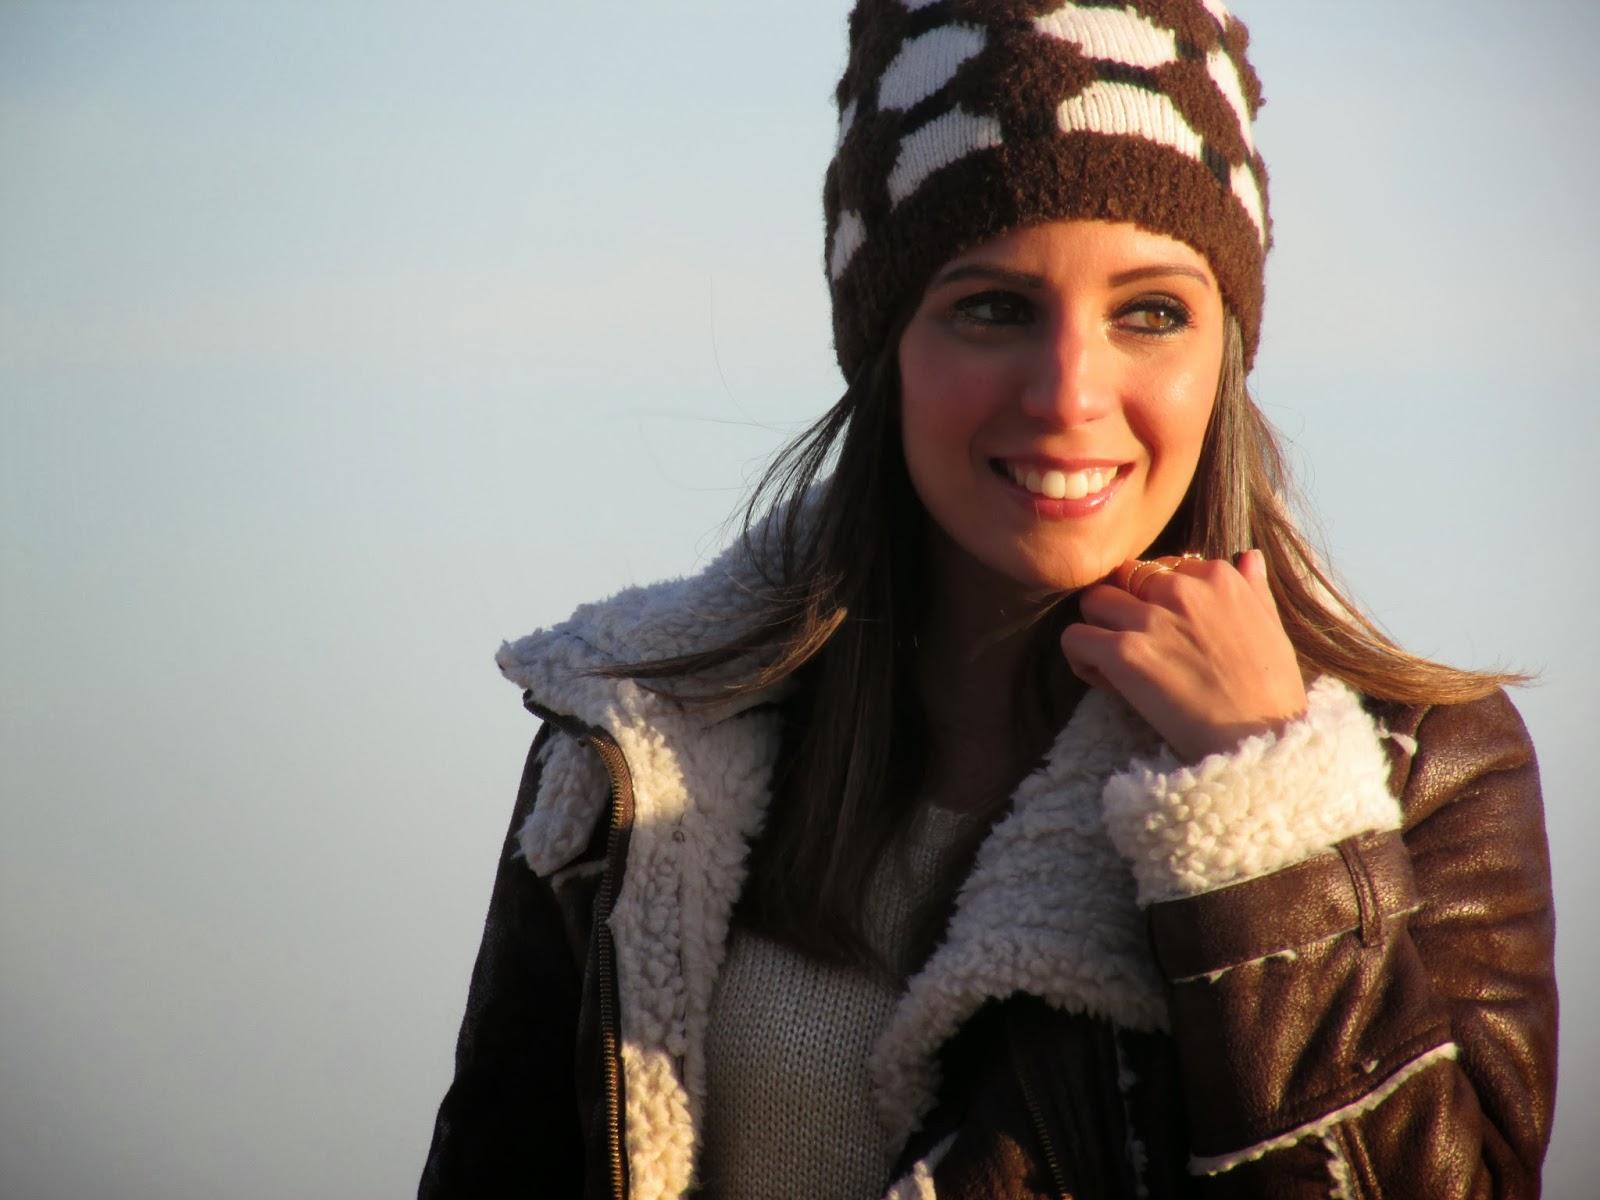 cristina style street style fashion blogger malagueña inspiration outfit look tendencias moda